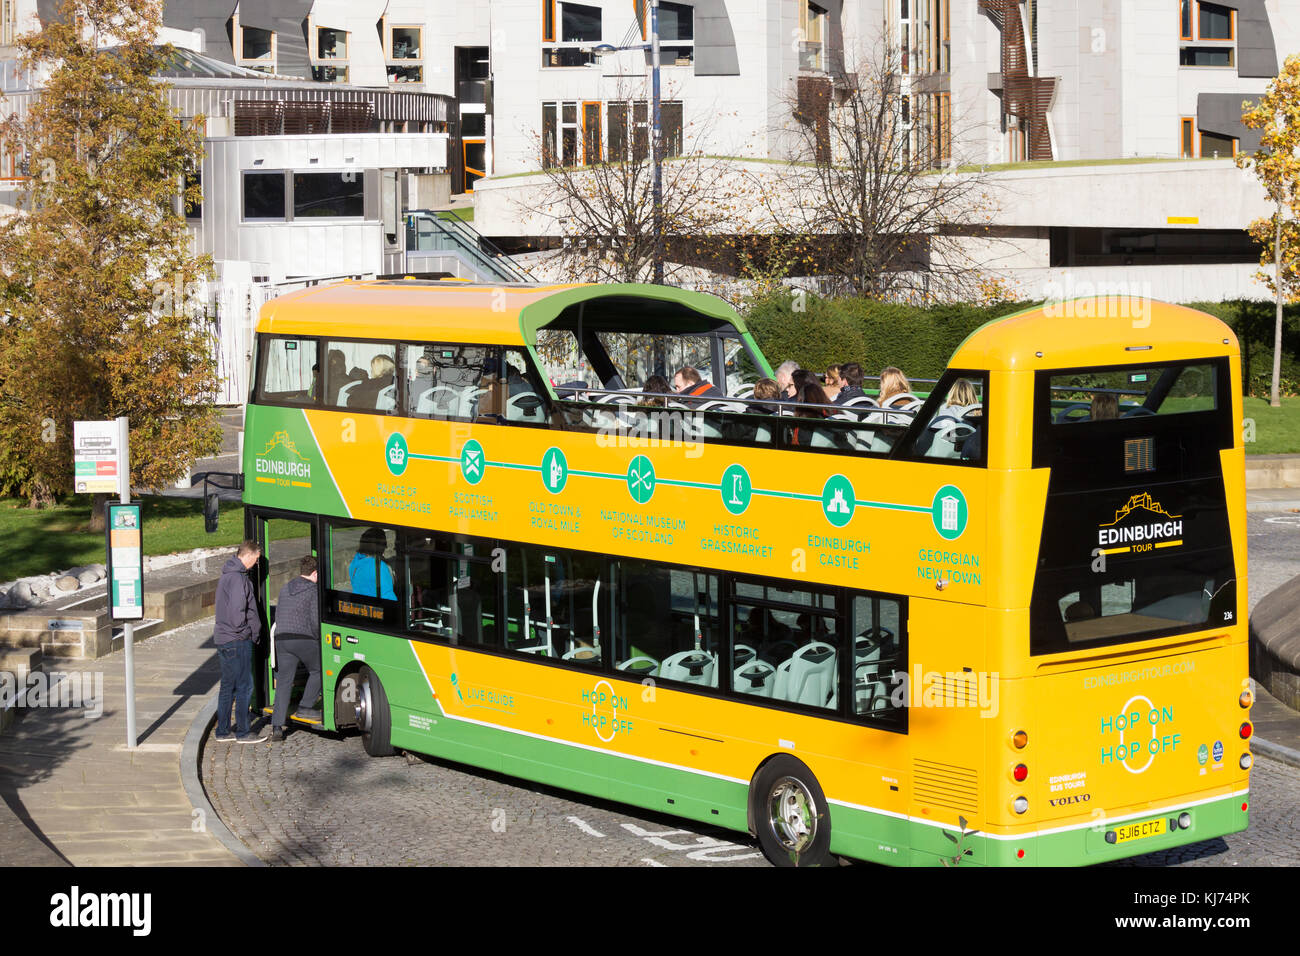 Sightseeing bus outside Scottish Parliament building in Edinburgh, Scotland. UK - Stock Image